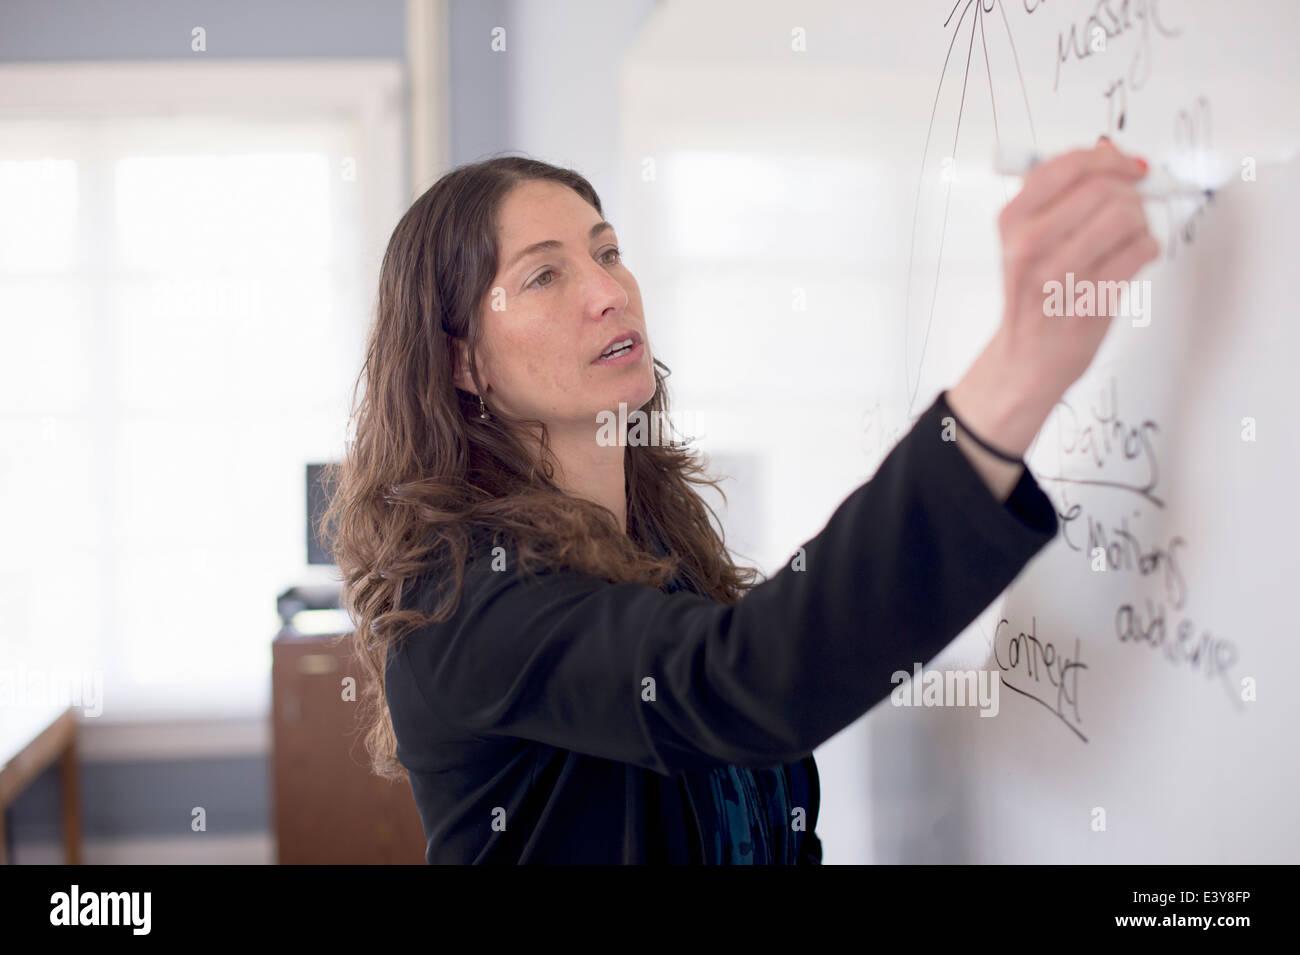 Teacher writing on whiteboard - Stock Image